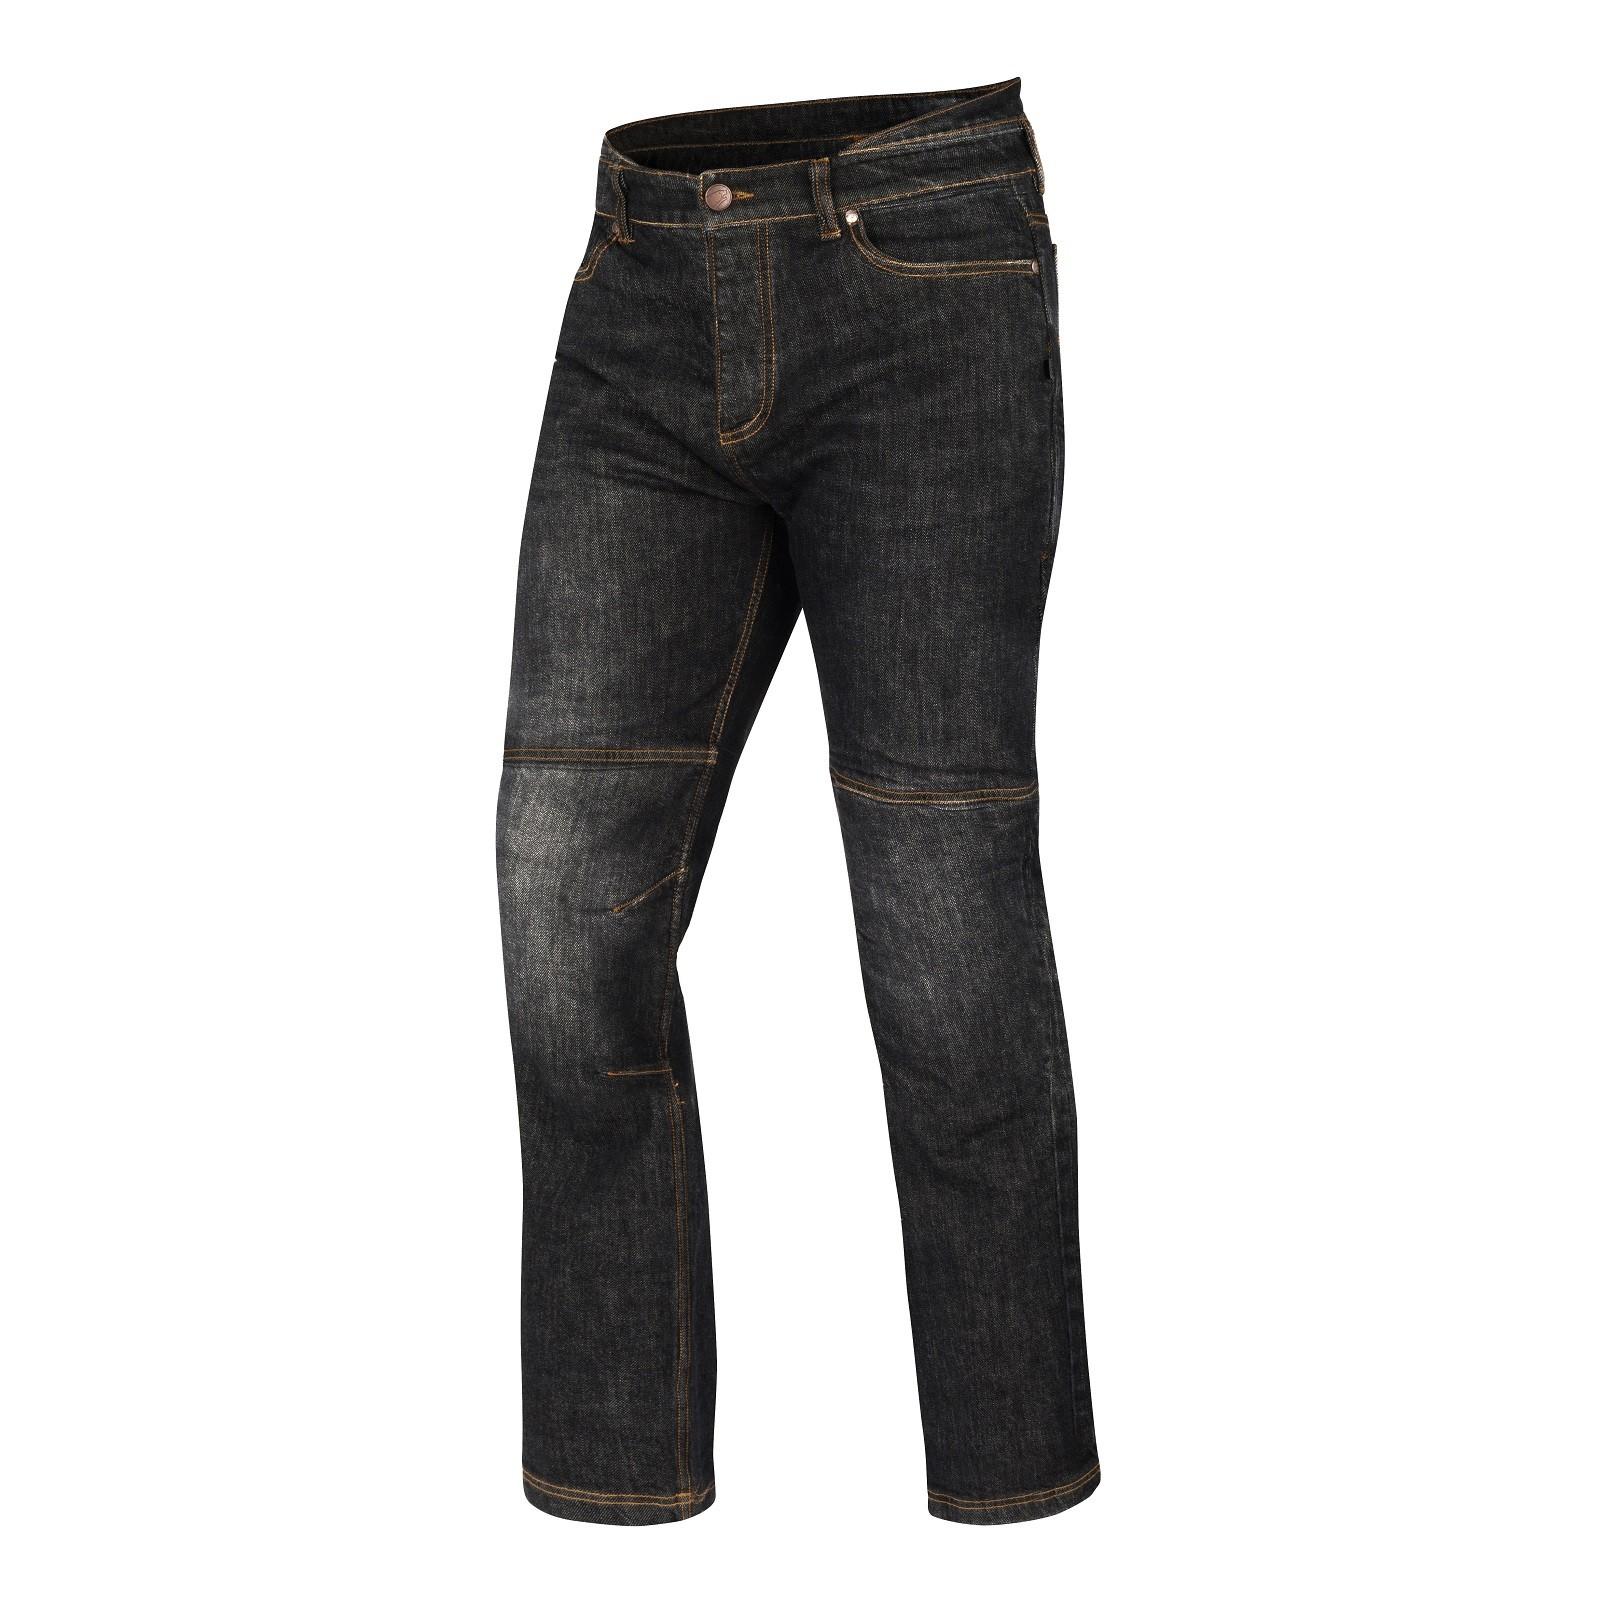 Pantalon RANDAL Noir / BTP470